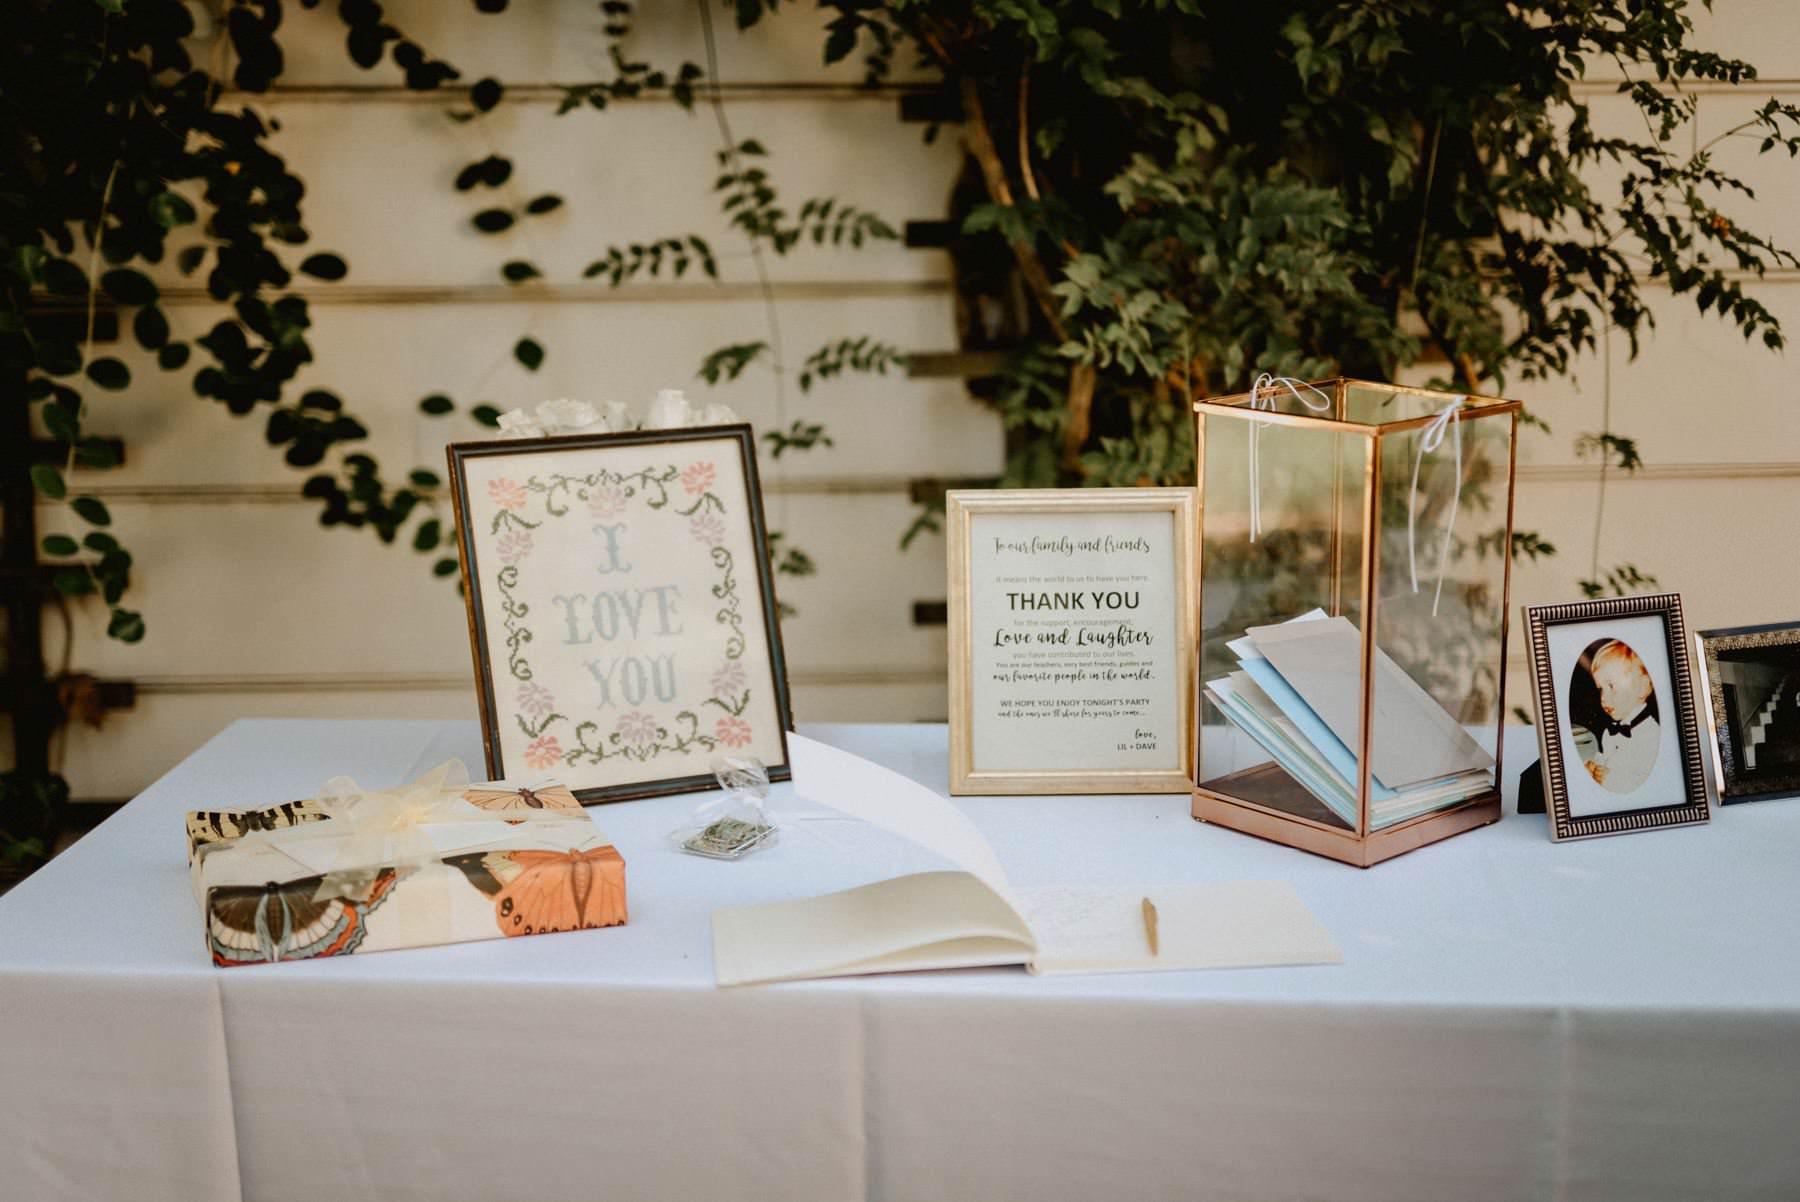 Appleford-estate-wedding-106.jpg